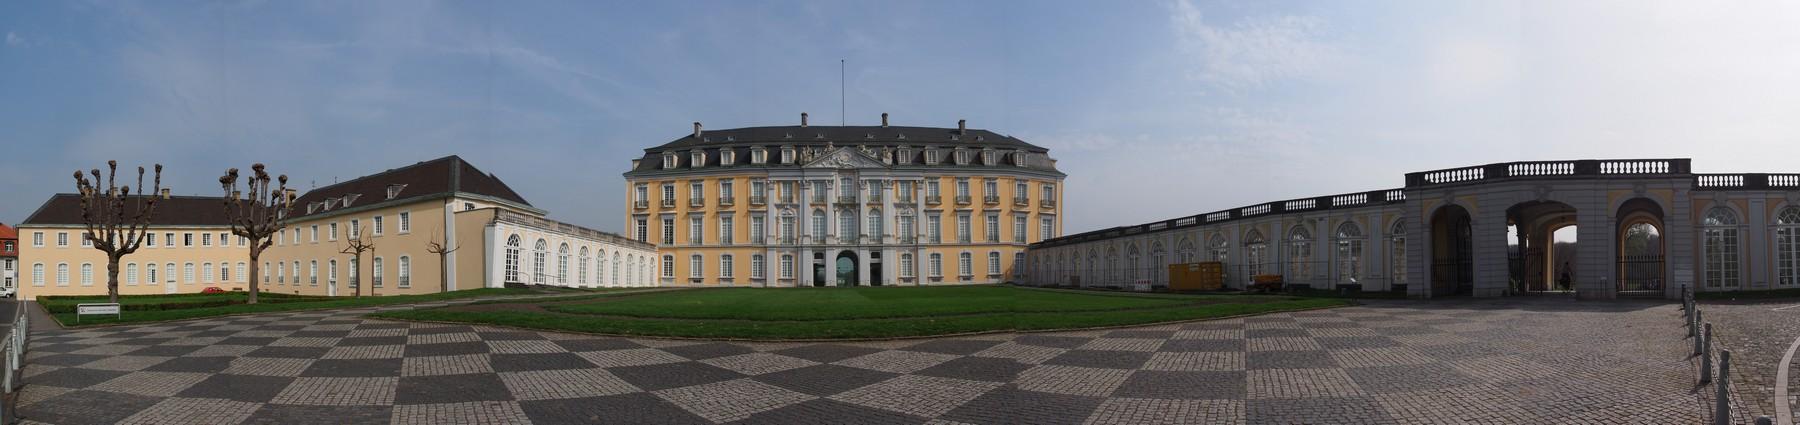 P4015496 Pano Palacio Augustusburg Bruhl Alemania UNESCO